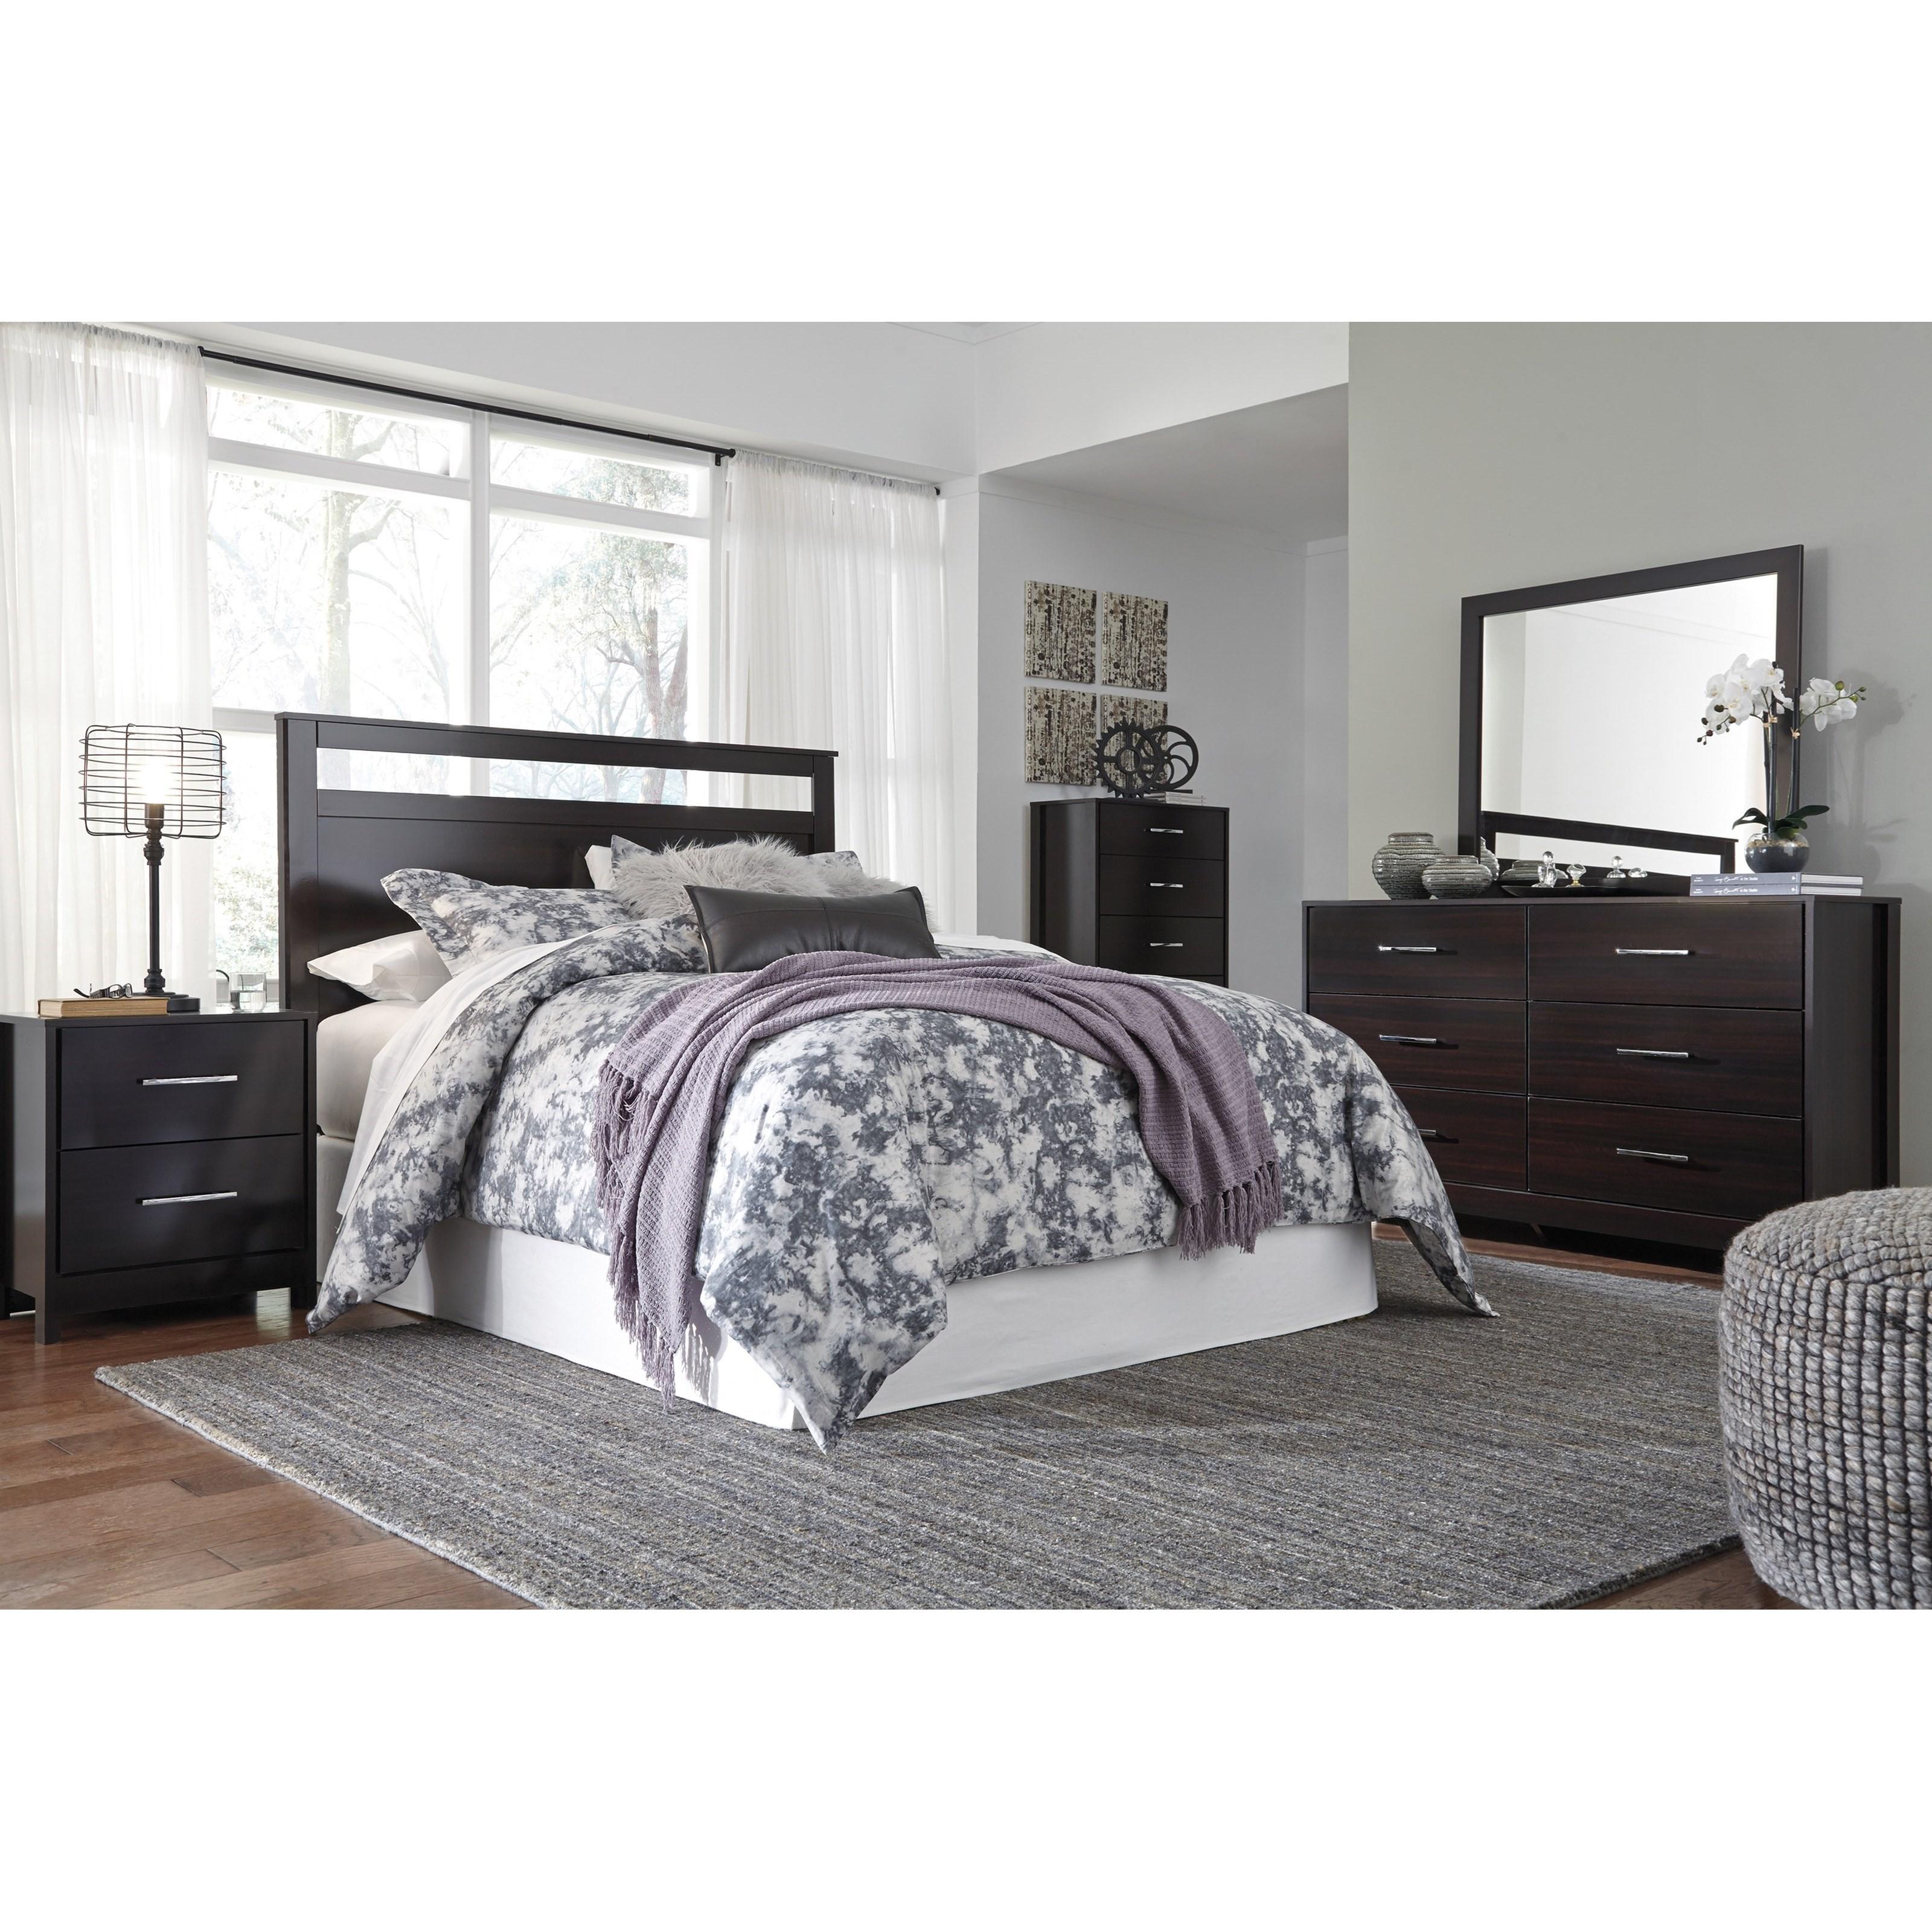 Signature Design by Ashley Agella King/Cal King Bedroom Group - Item Number: B072 K Bedroom Group 2